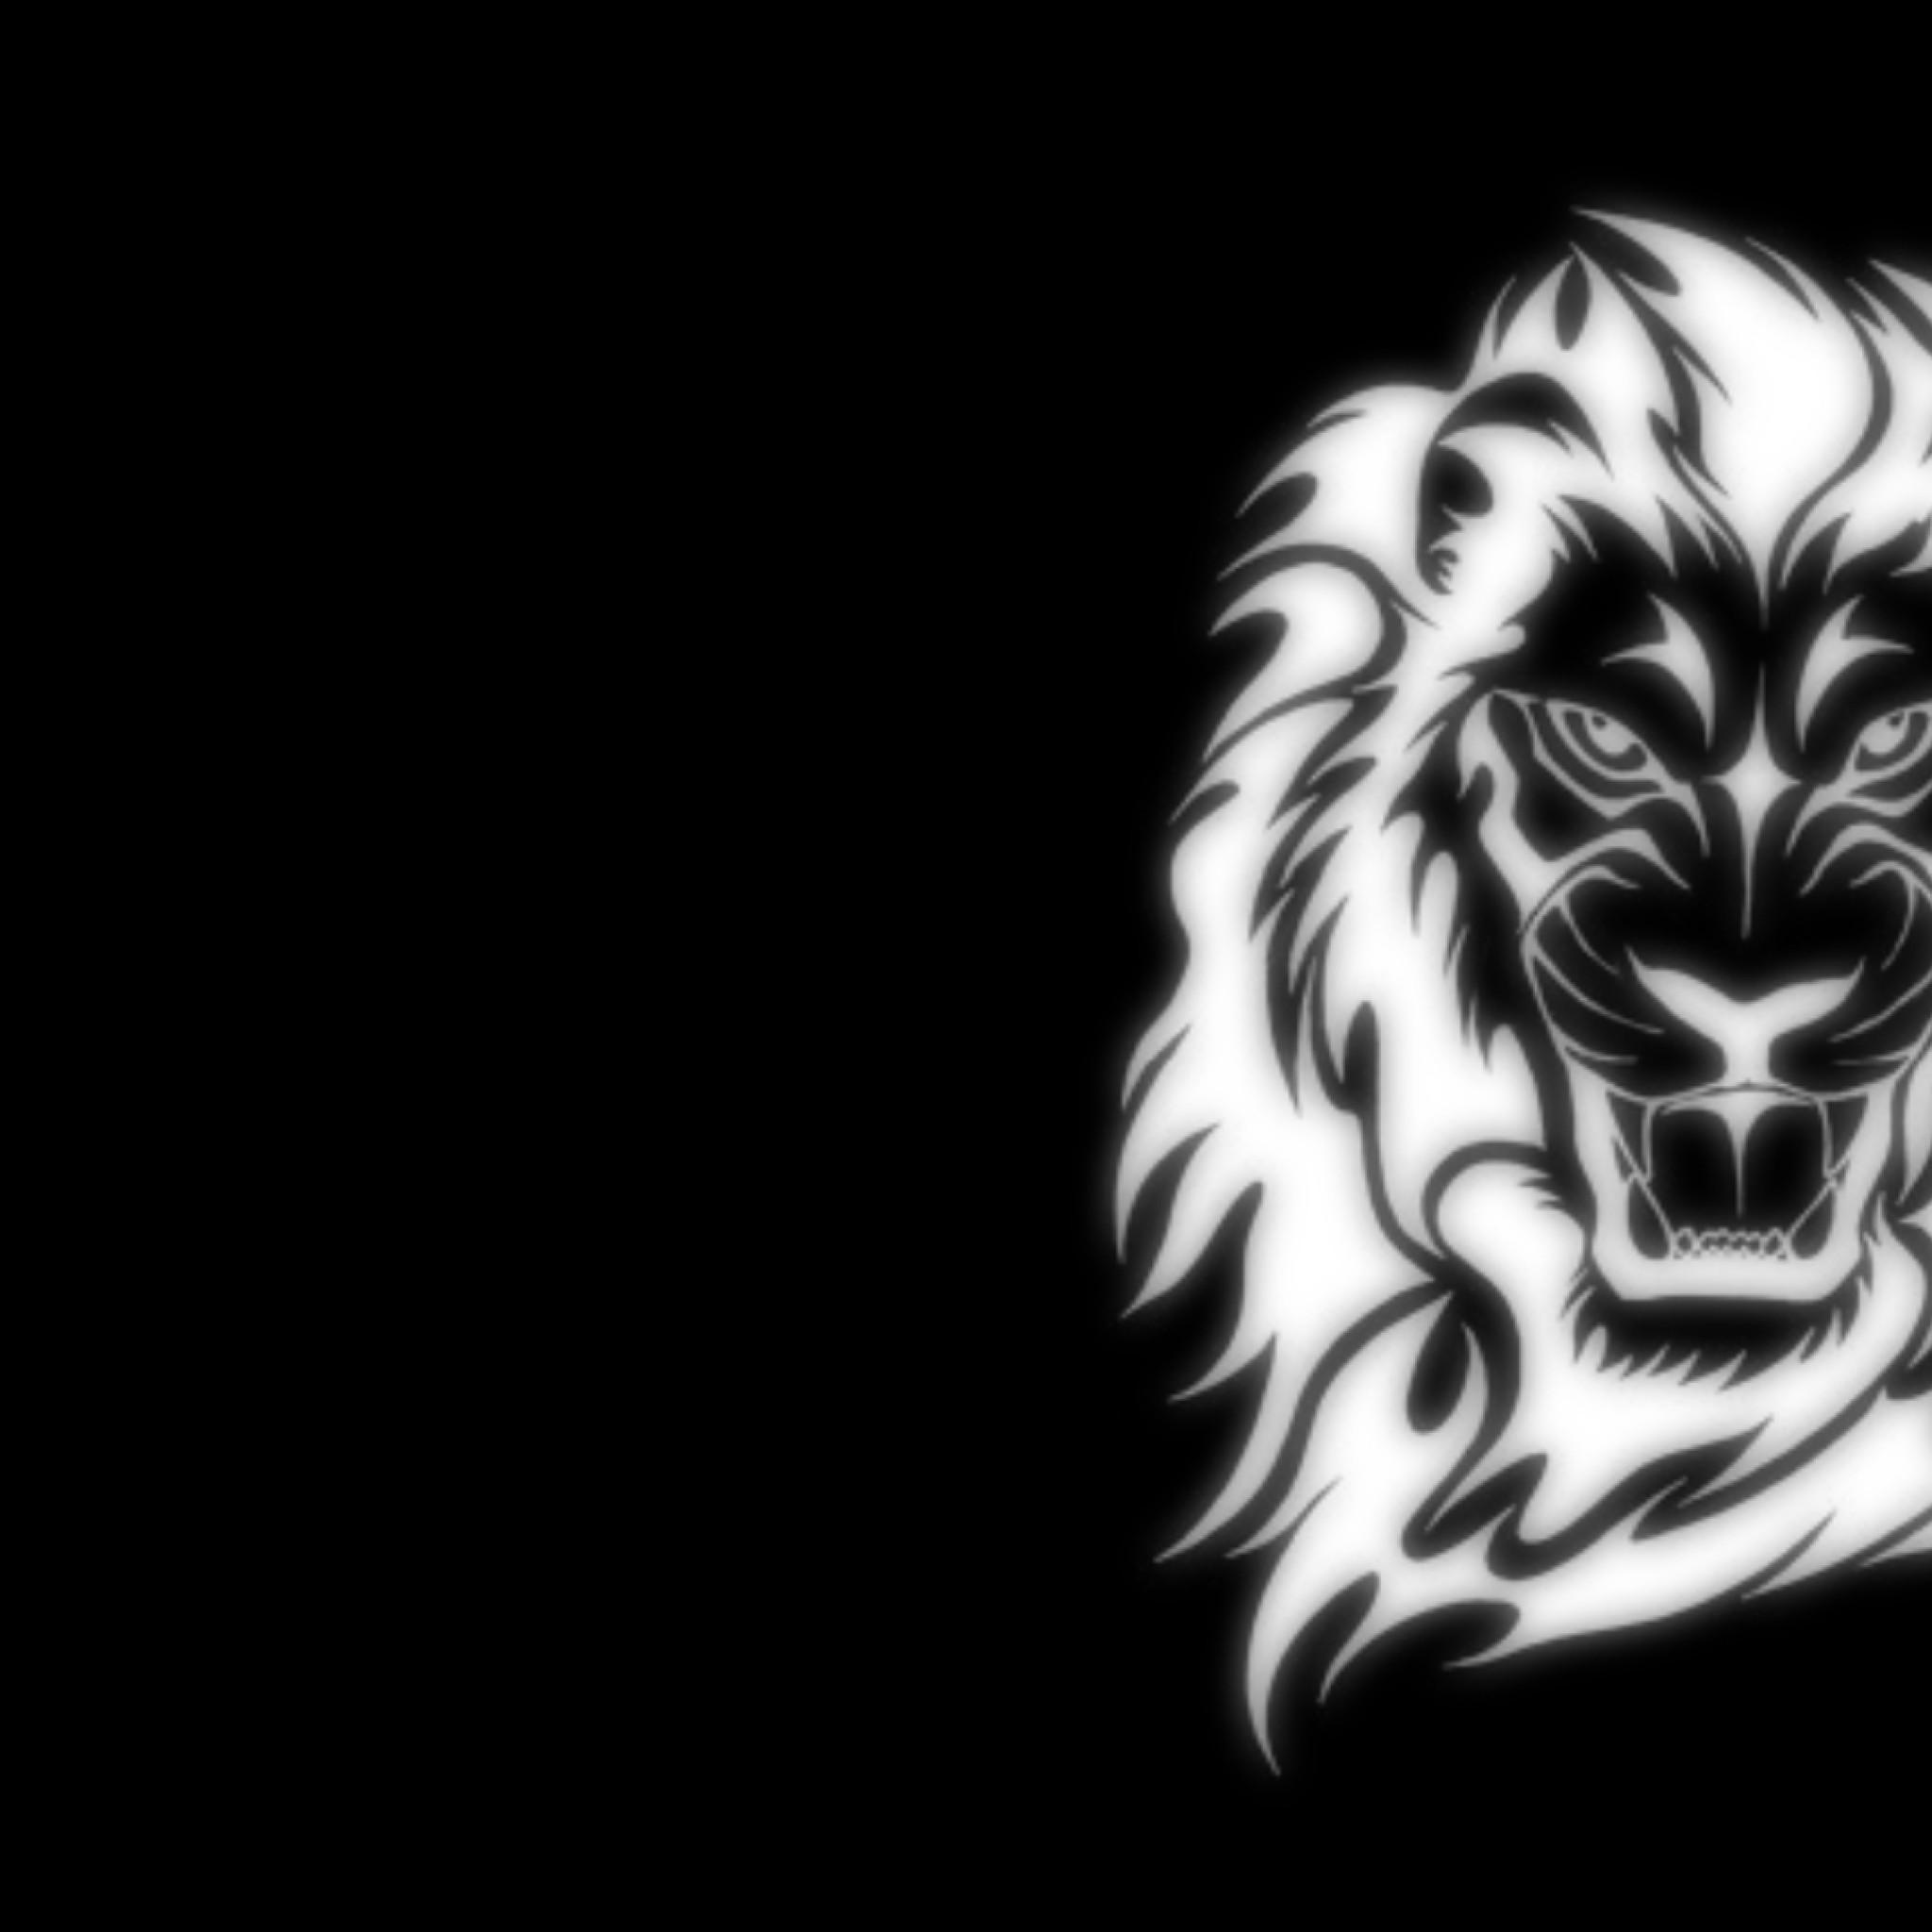 glowing lion art black cg computer glowing light lion white 2048x2048 2048x2048